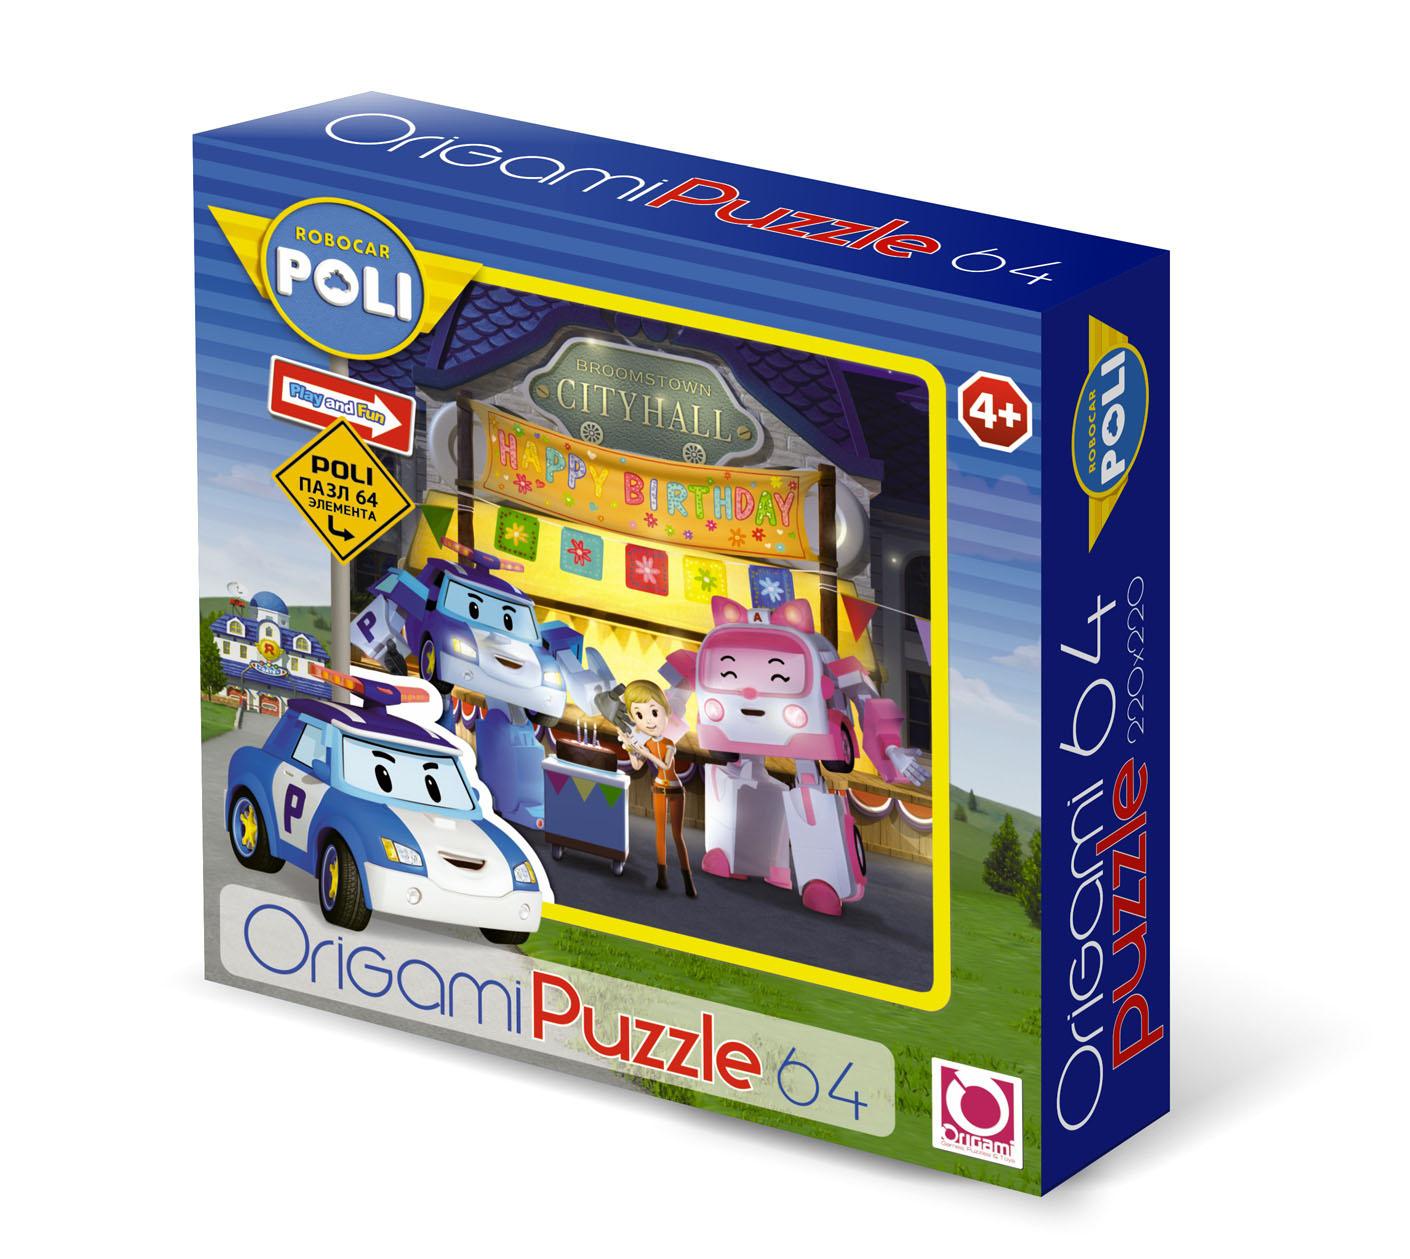 Паззл Robocar Poli 64 элемента.